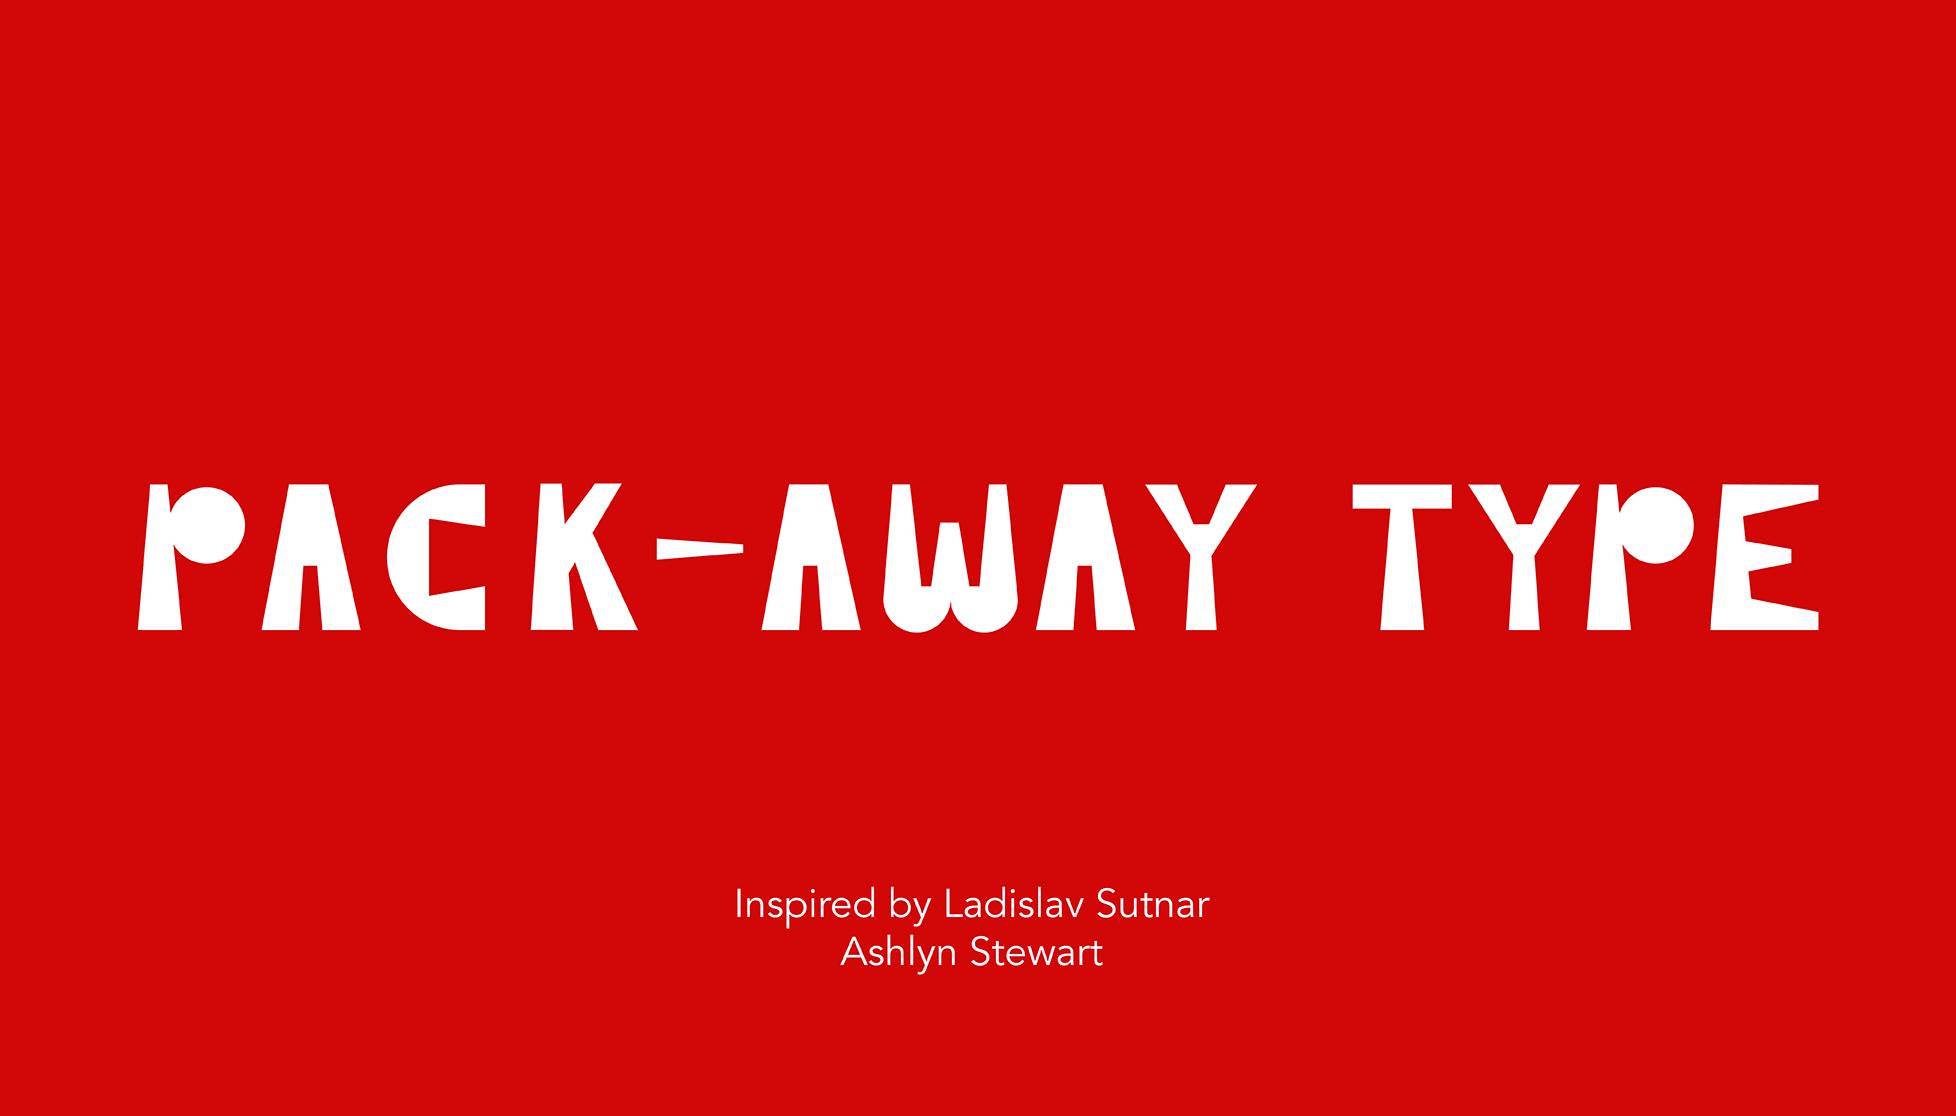 Pack-Away Type by Ashlyn Stewart